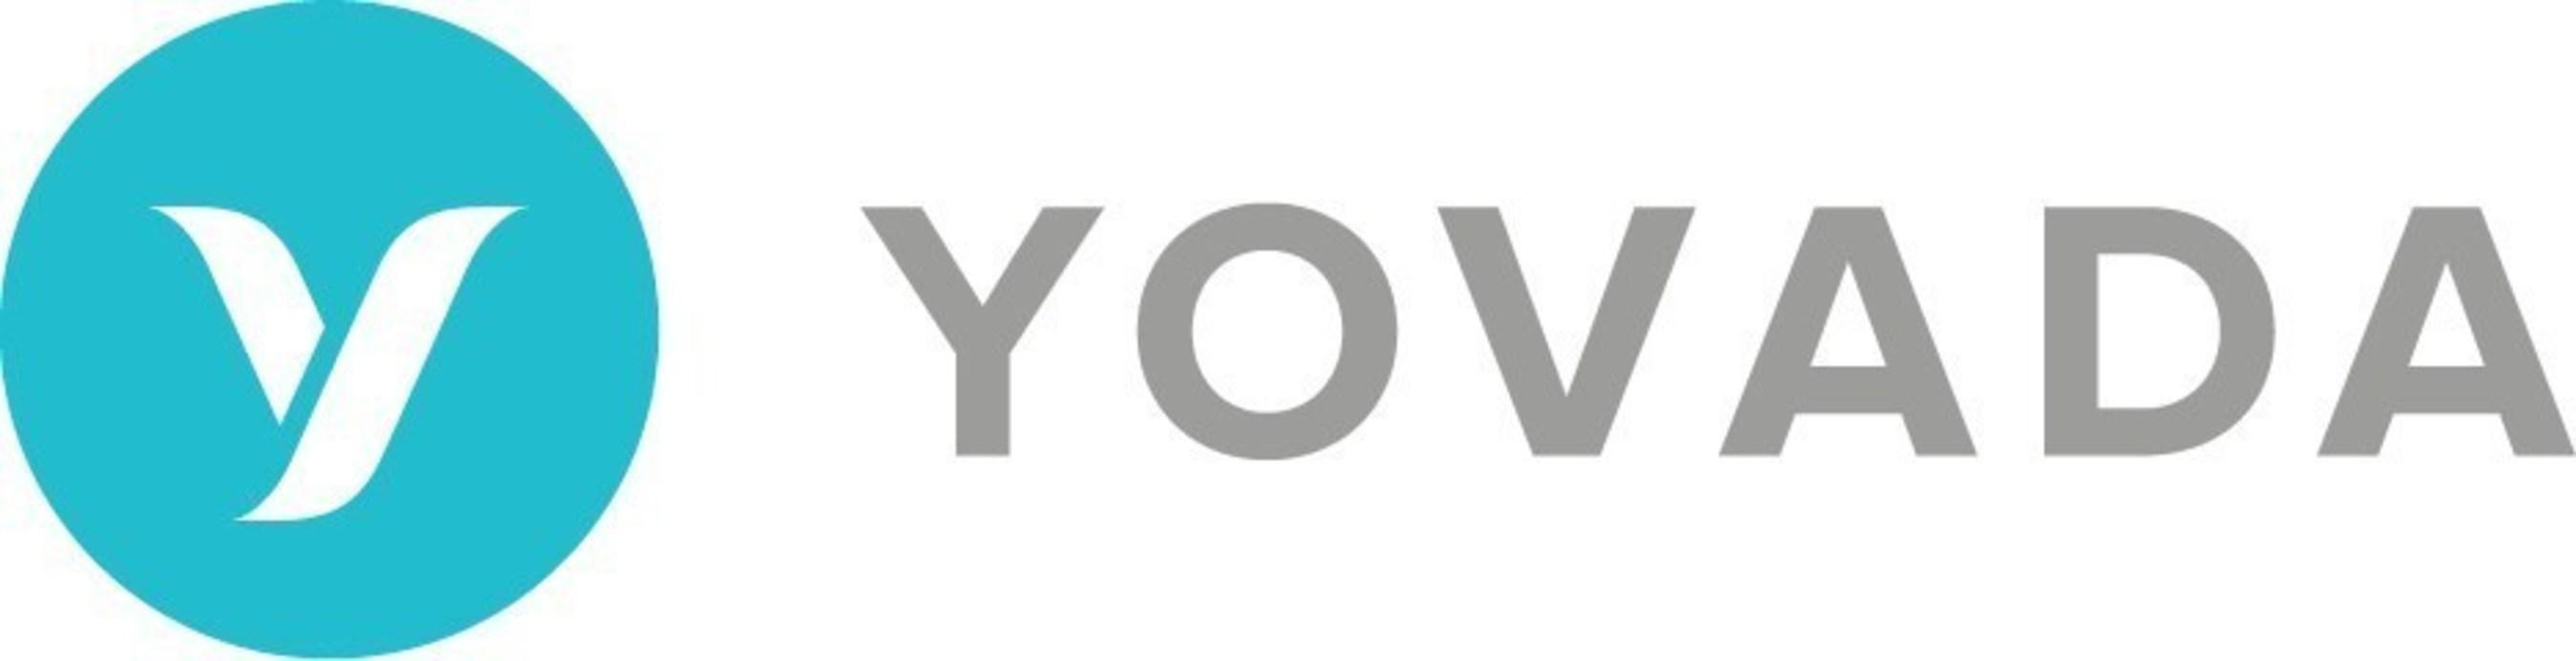 Yovada Announces a Yoga Retreat Giveaway on #InternationalYogaDay